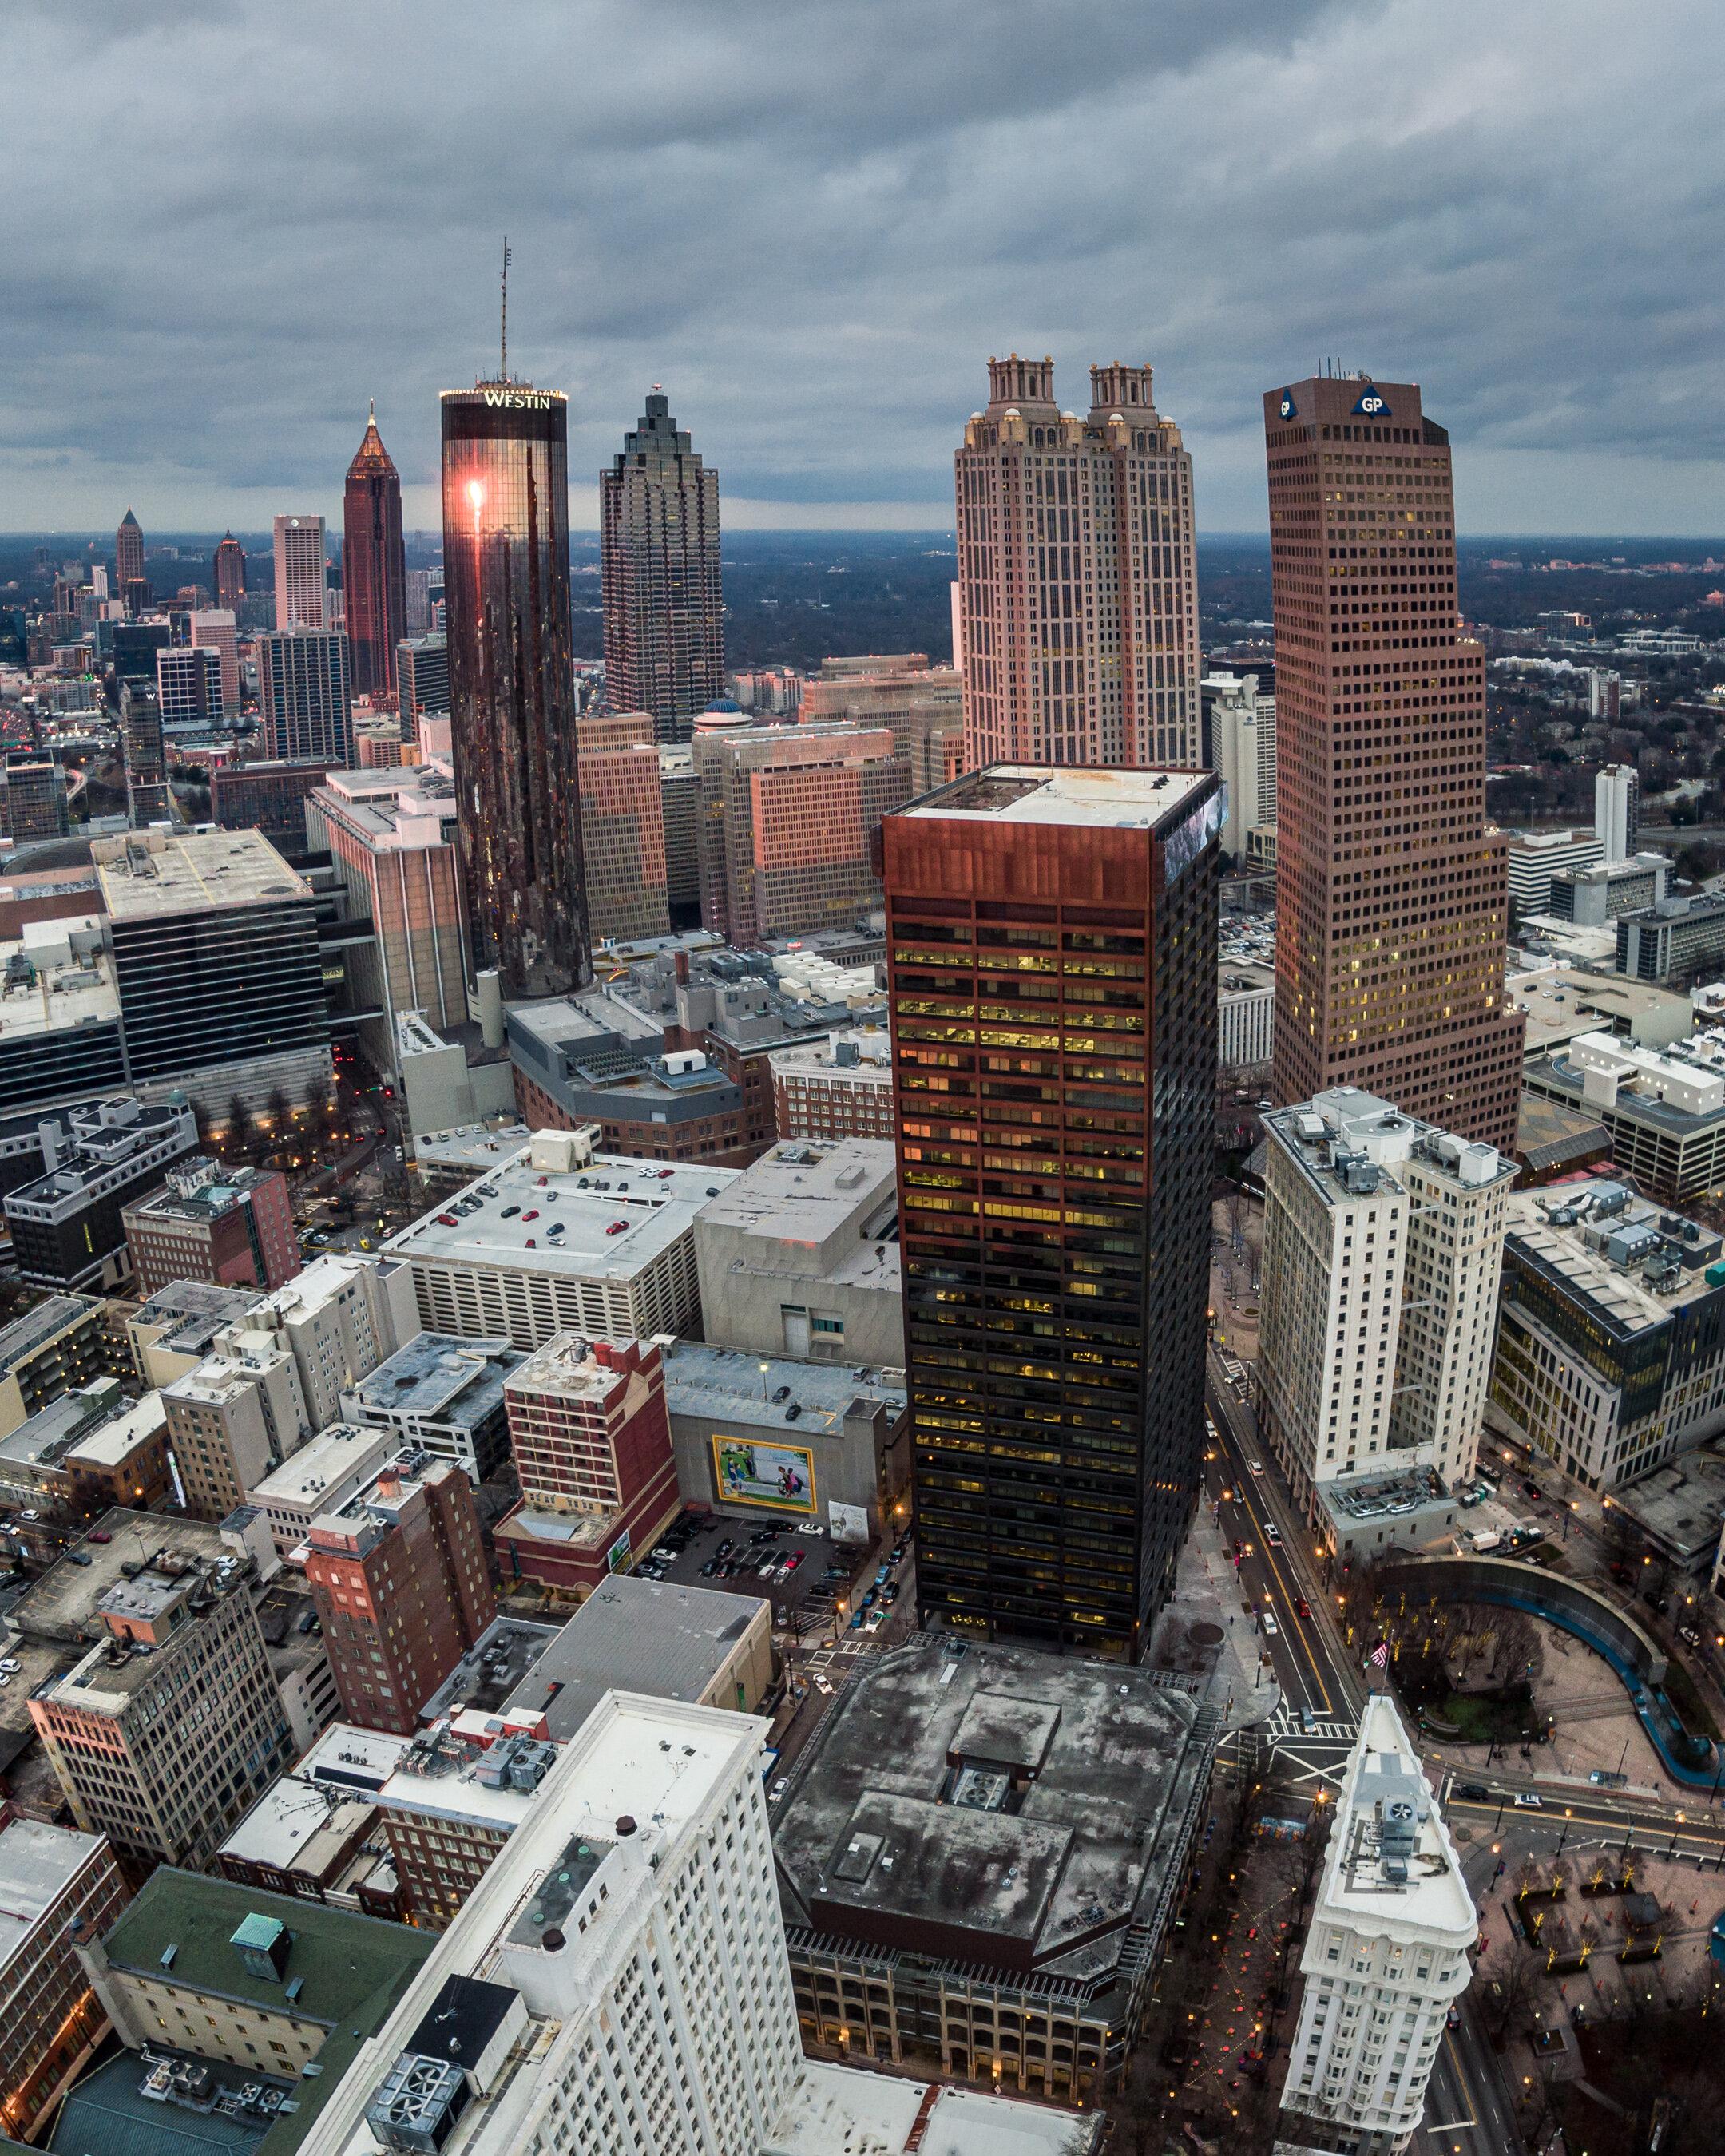 Aerial Atlanta Skyline SunTrust Bank of America